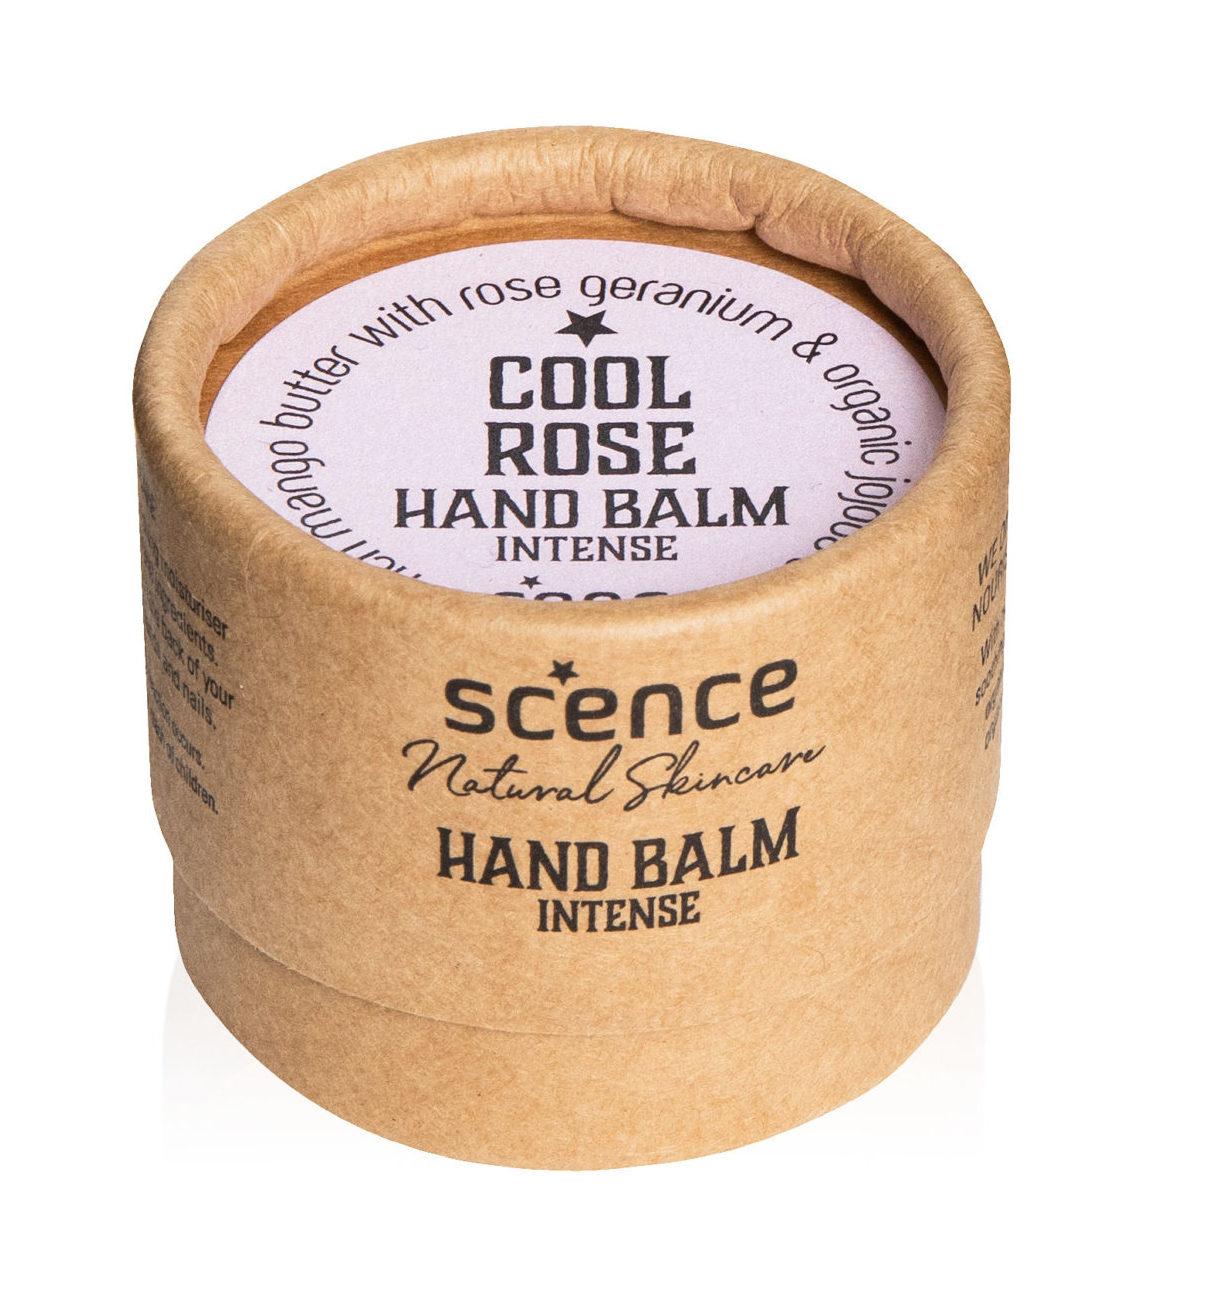 Scence Hand Balm